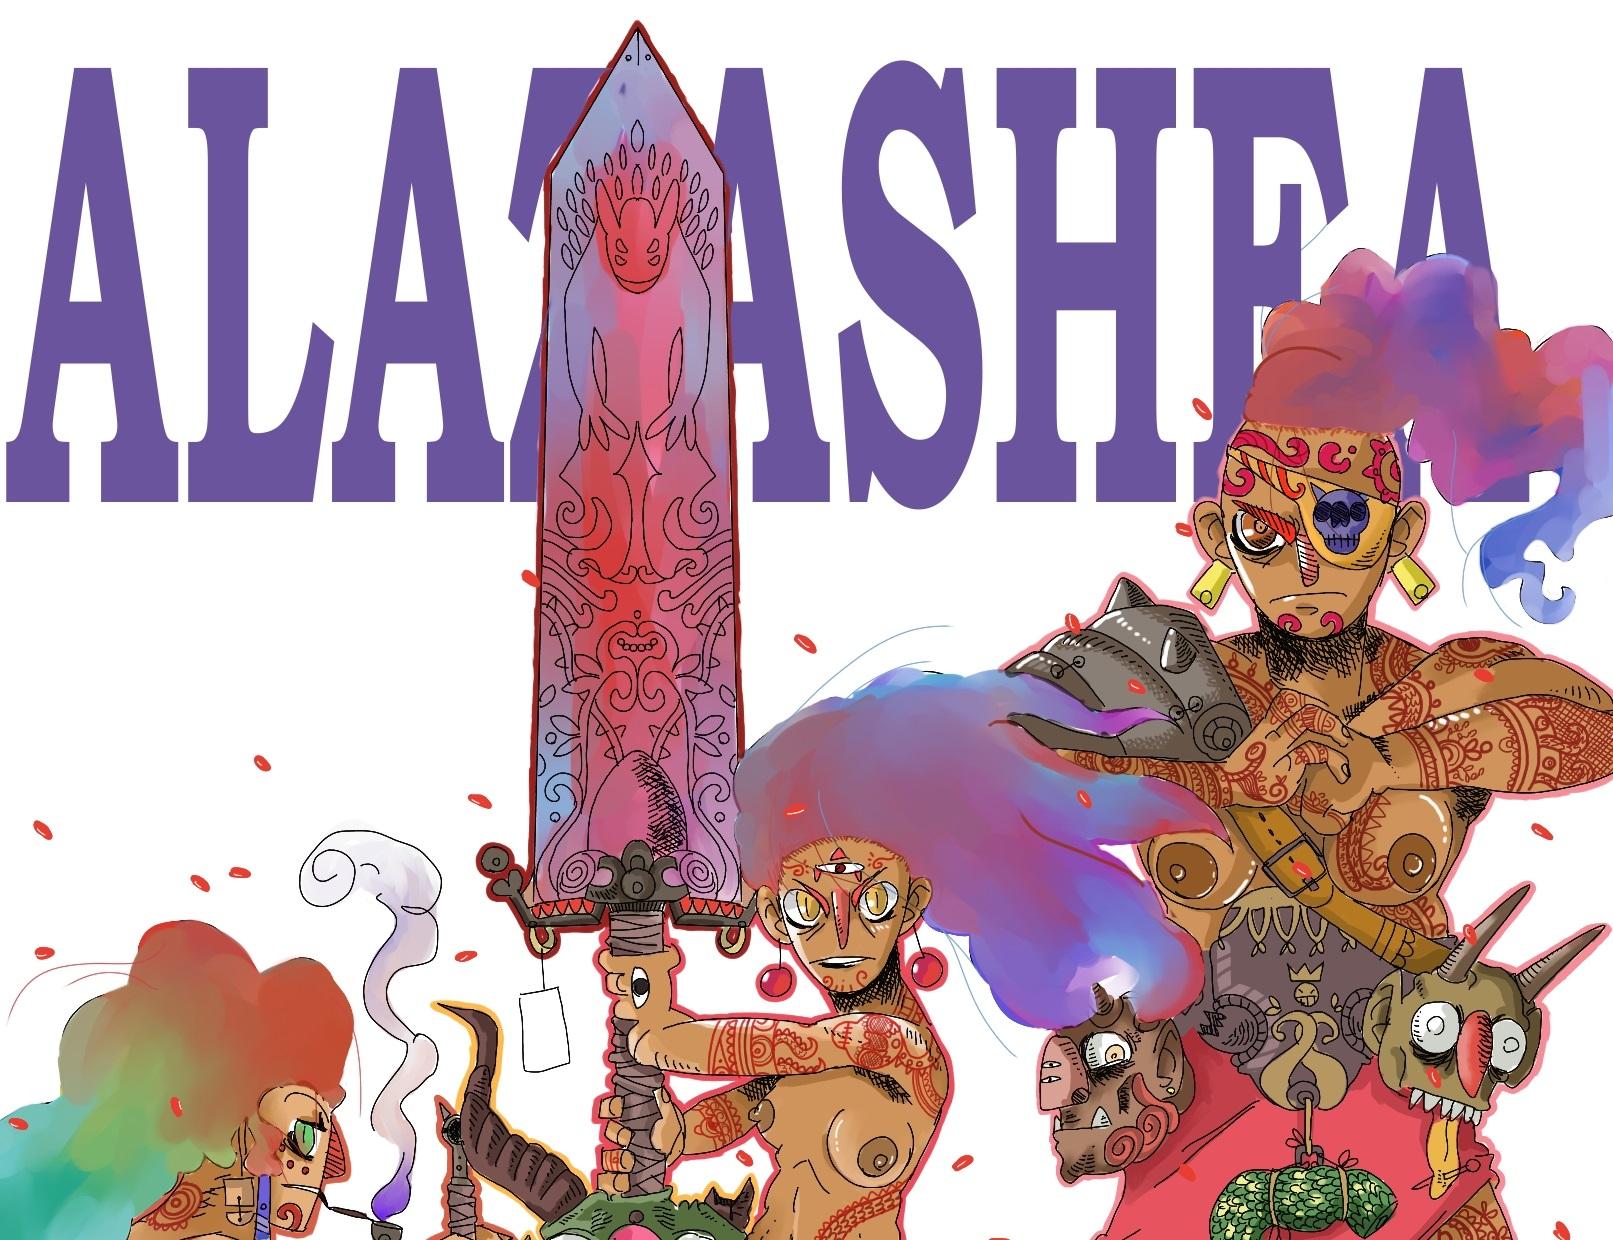 La spada di Alazashea